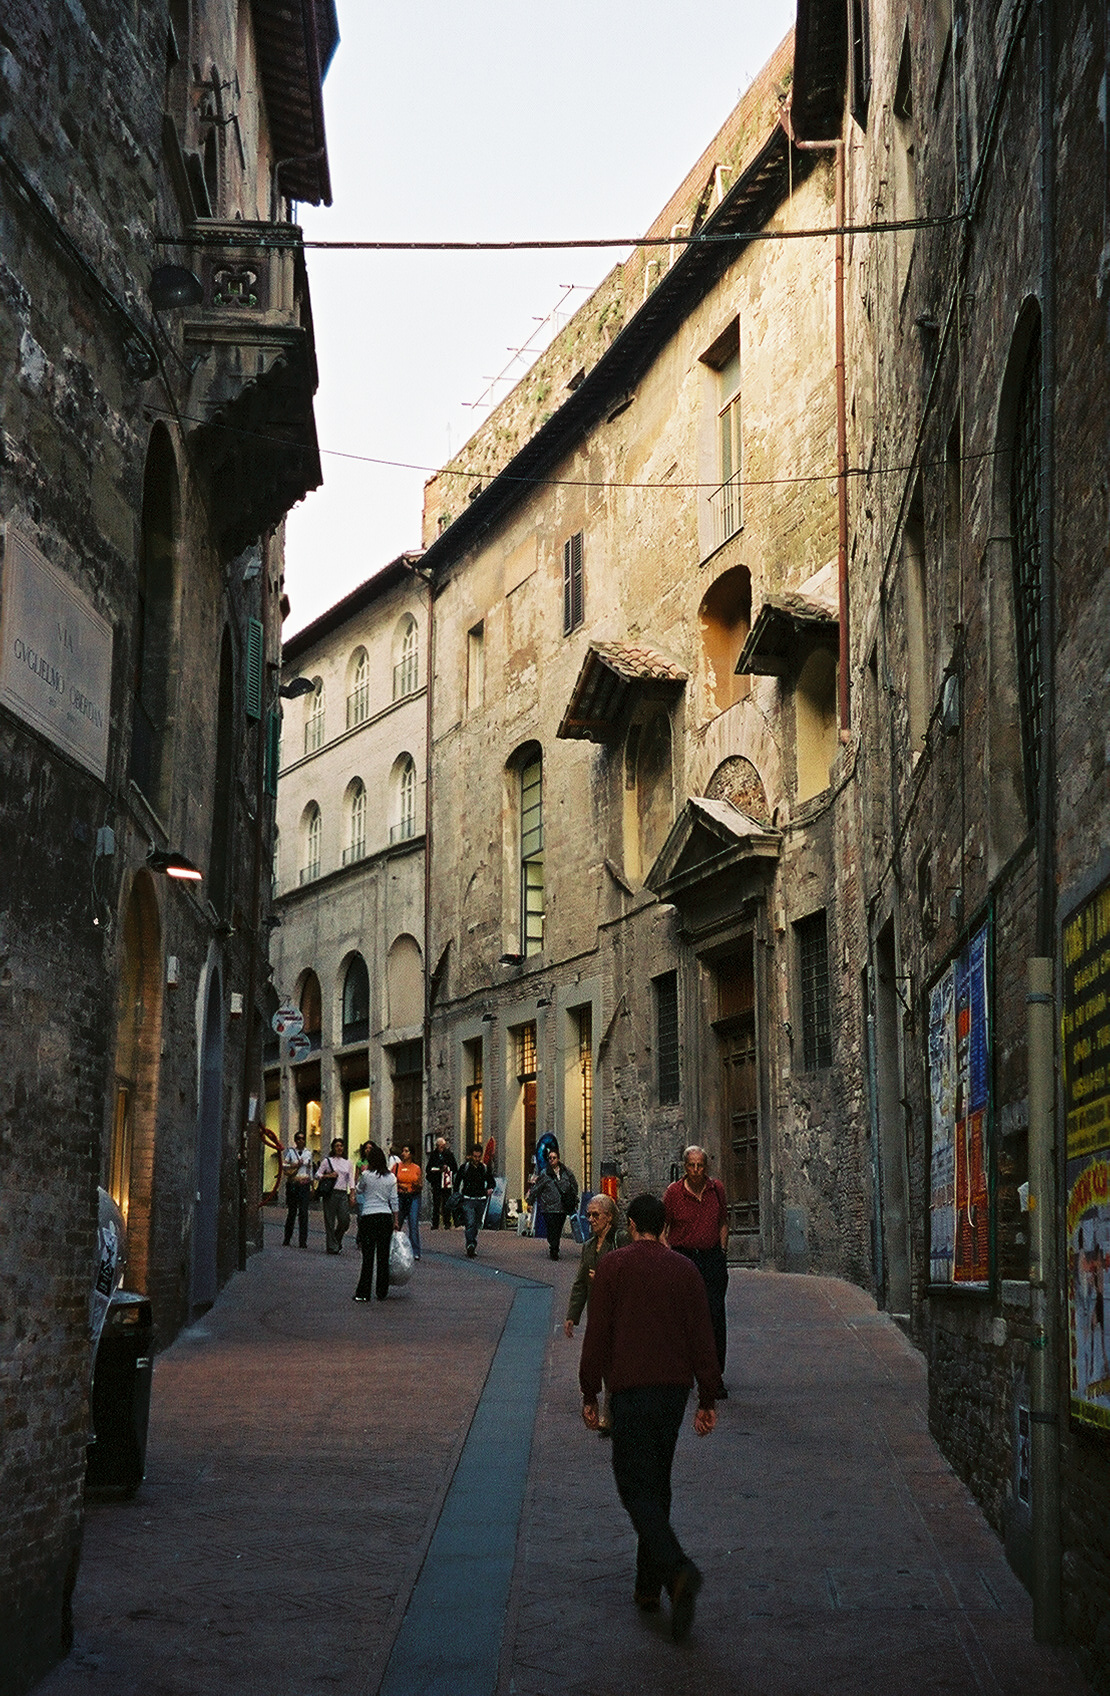 http://upload.wikimedia.org/wikipedia/commons/b/bc/Perugia-via-Oberdan.jpg